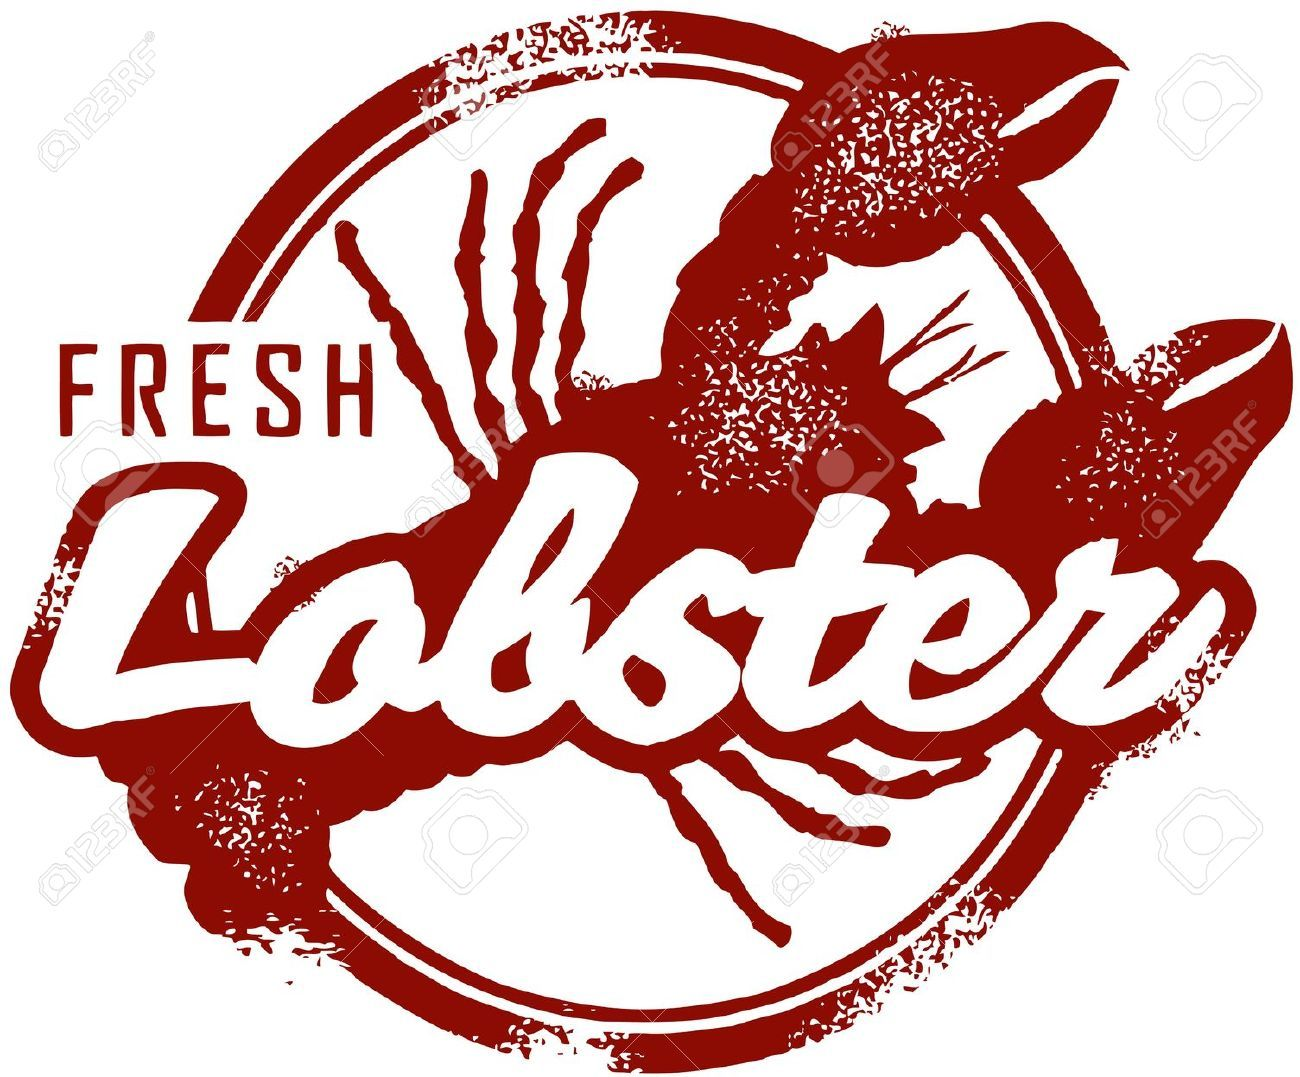 medium resolution of lobster stock vector illustration and royalty free lobster clipart